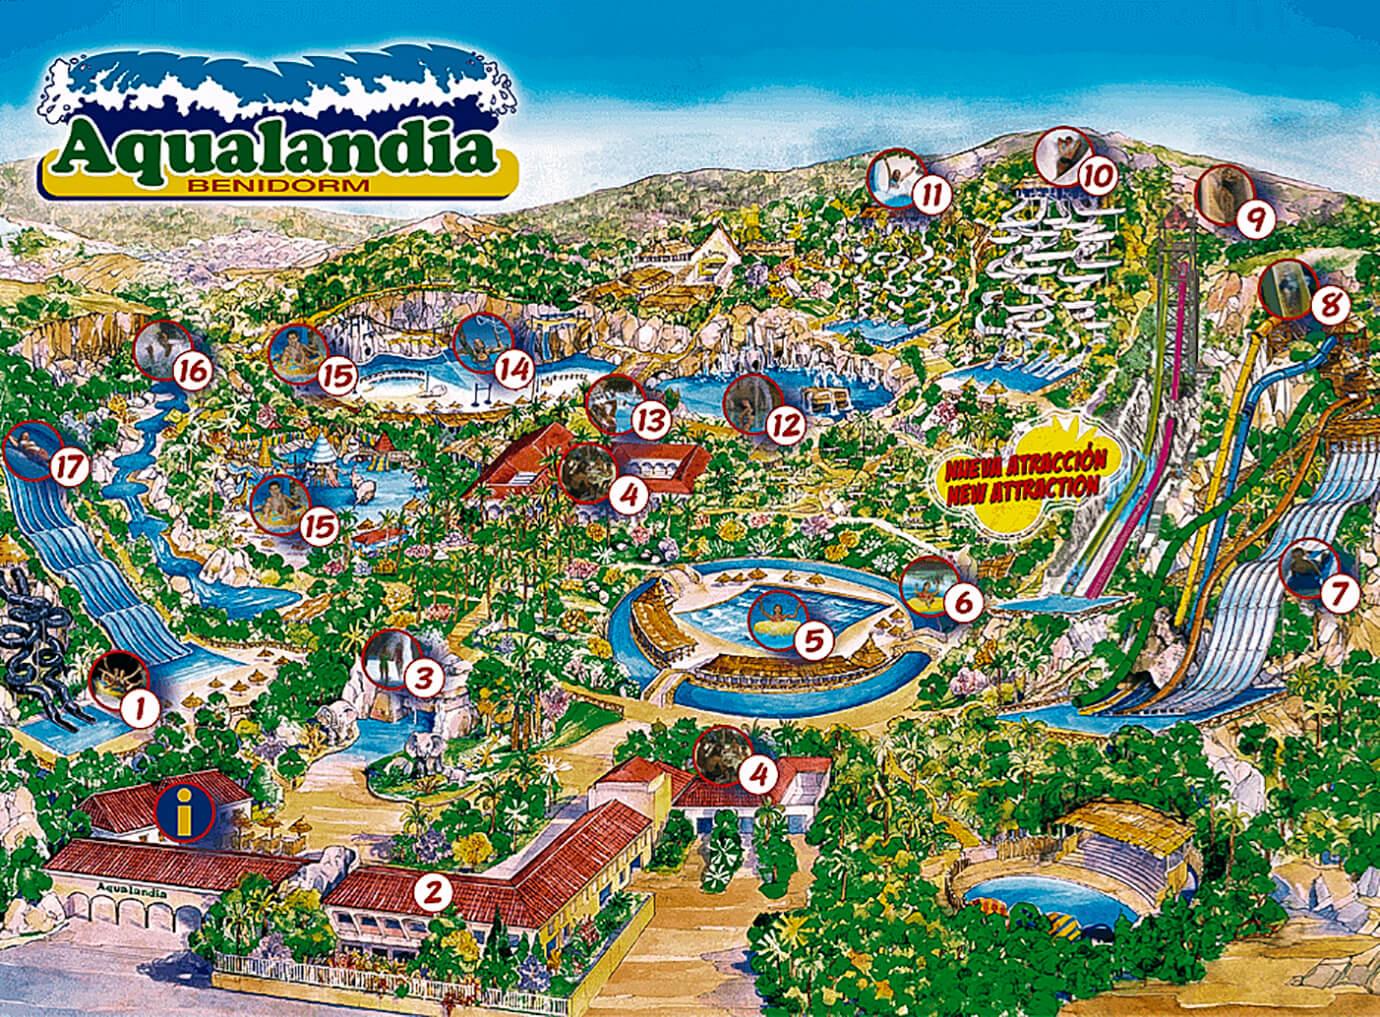 Aqualandia, Waterpark, pretpark, Costa-Blanca, Casa-Asombrosa